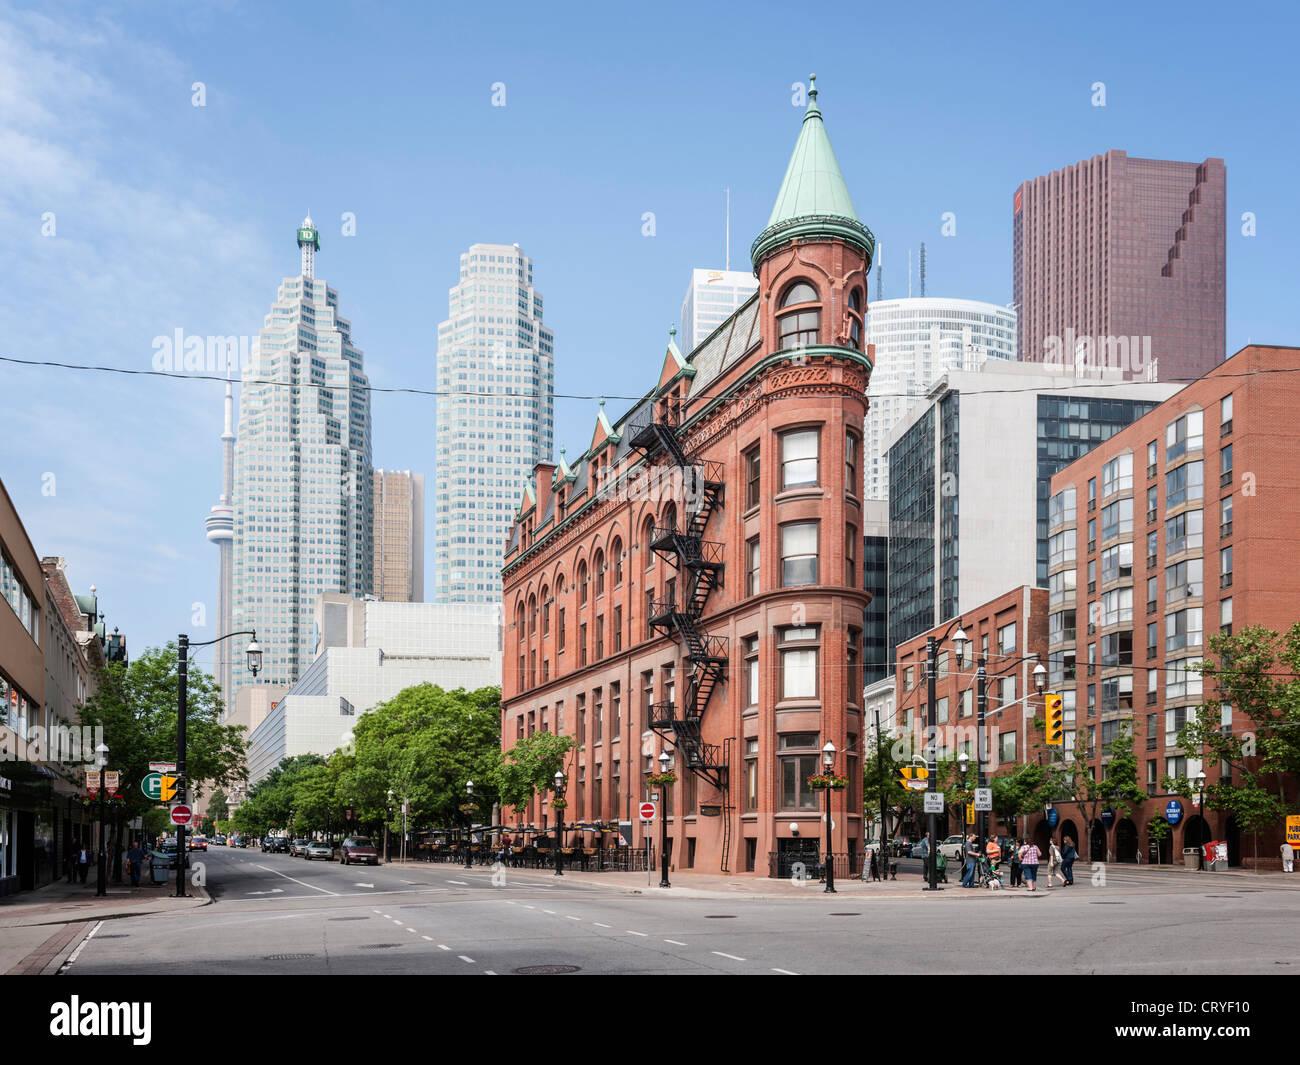 Flatiron Gooderham & Worts building, Toronto - Stock Image